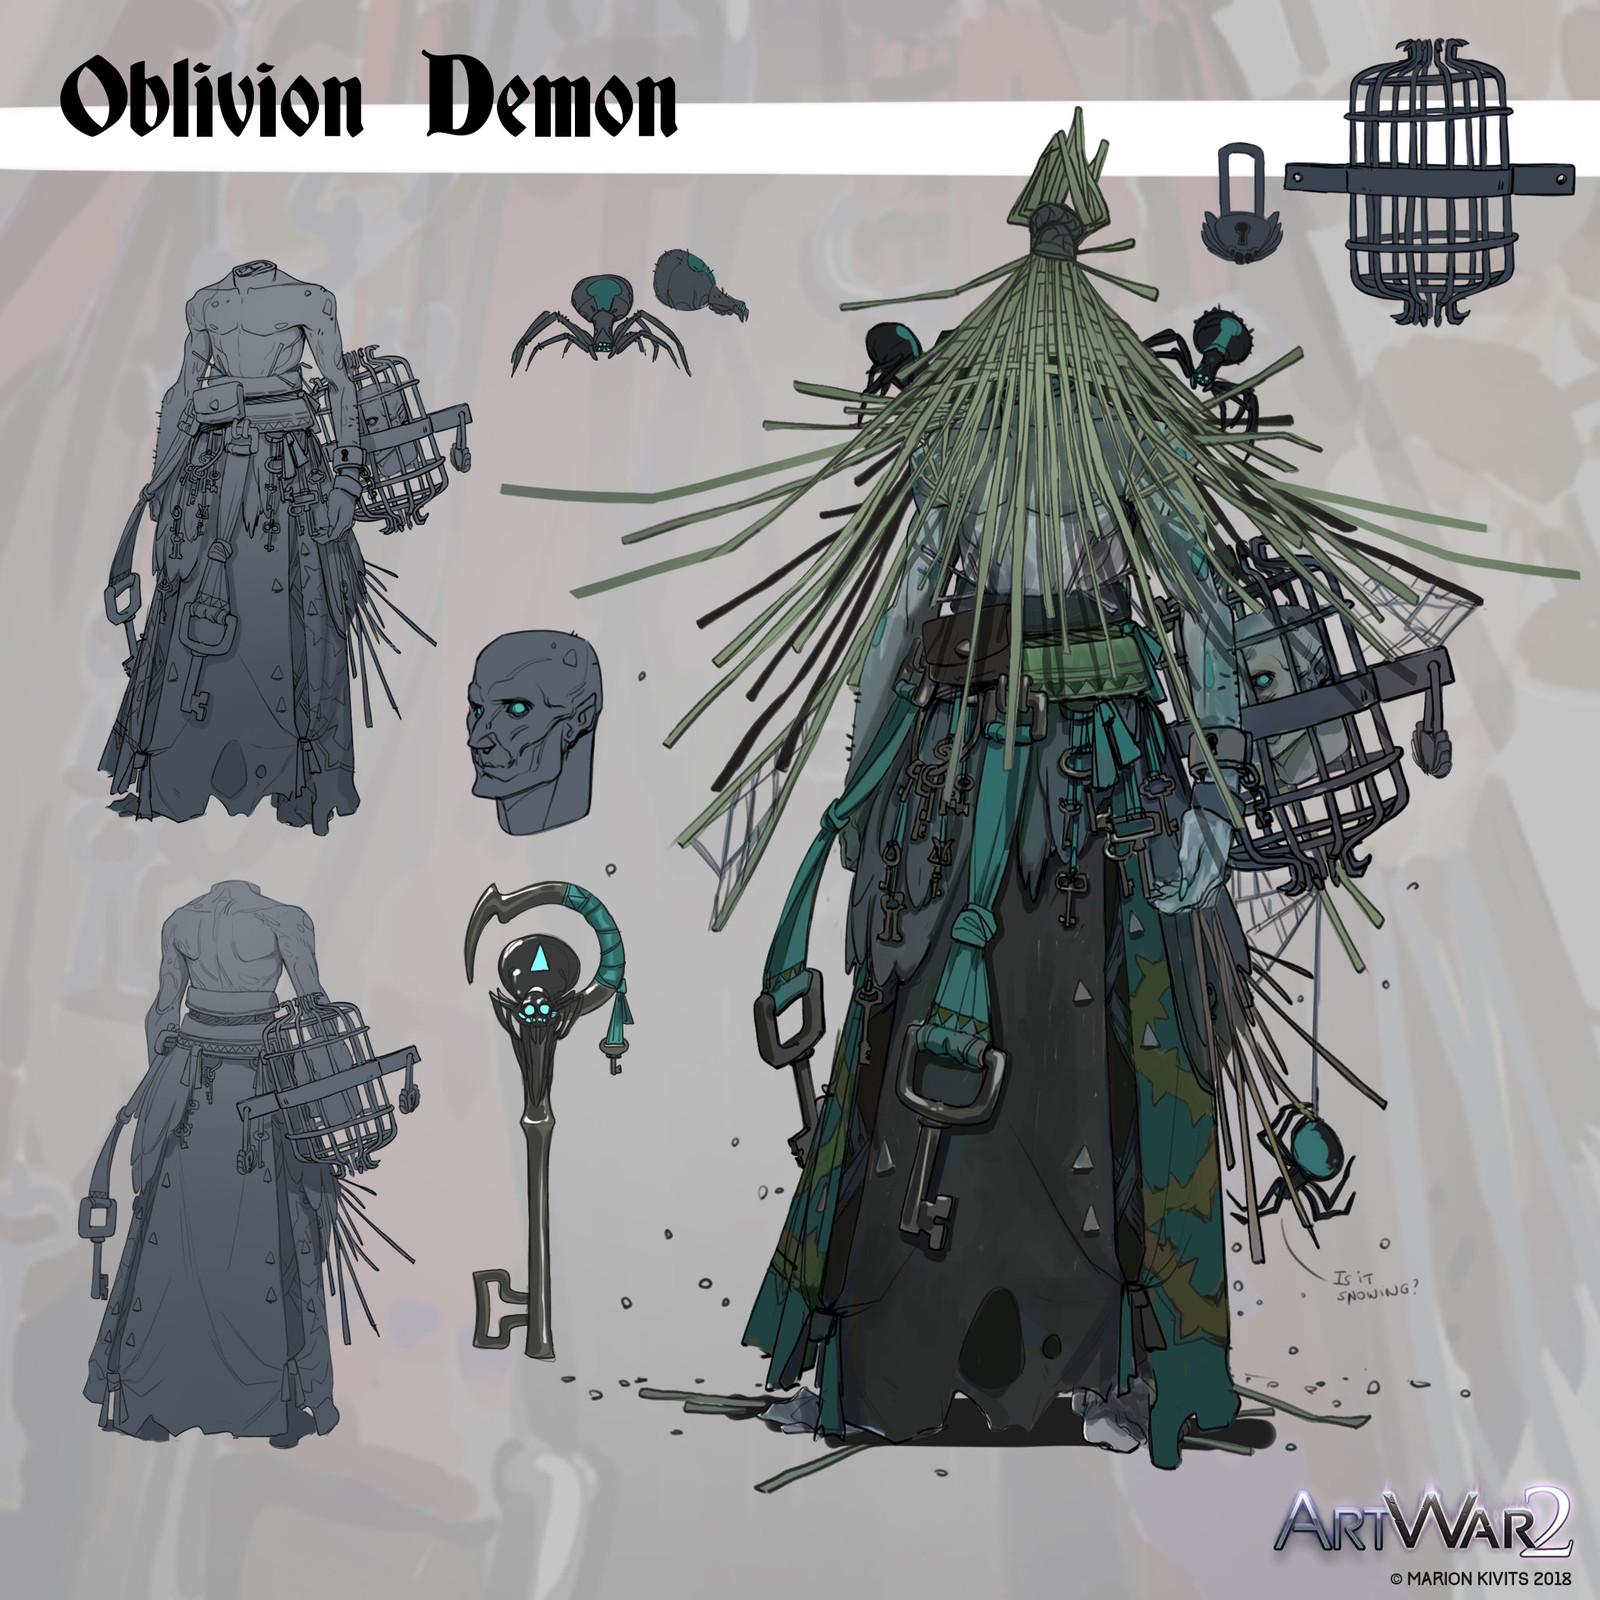 Oblivion Demon